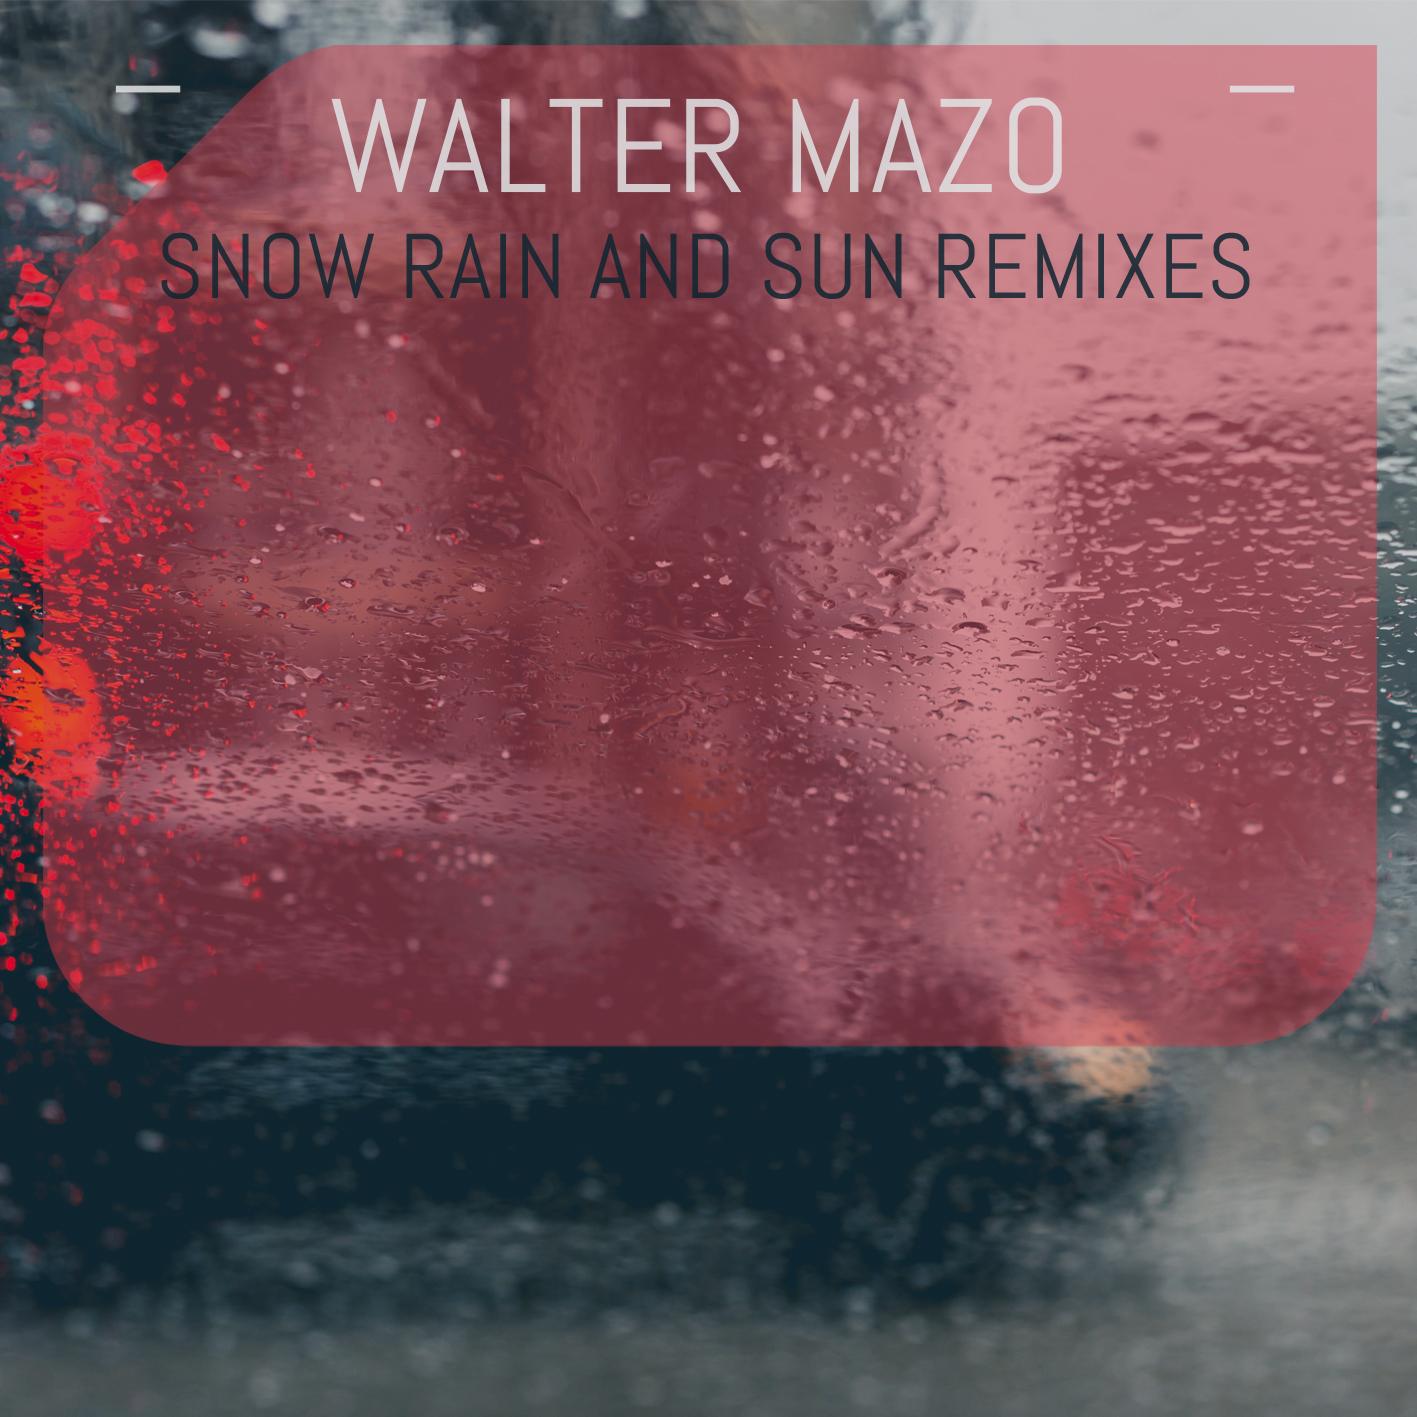 DMD022 - Walter Mazo - Snow Rain And Sun Remixes